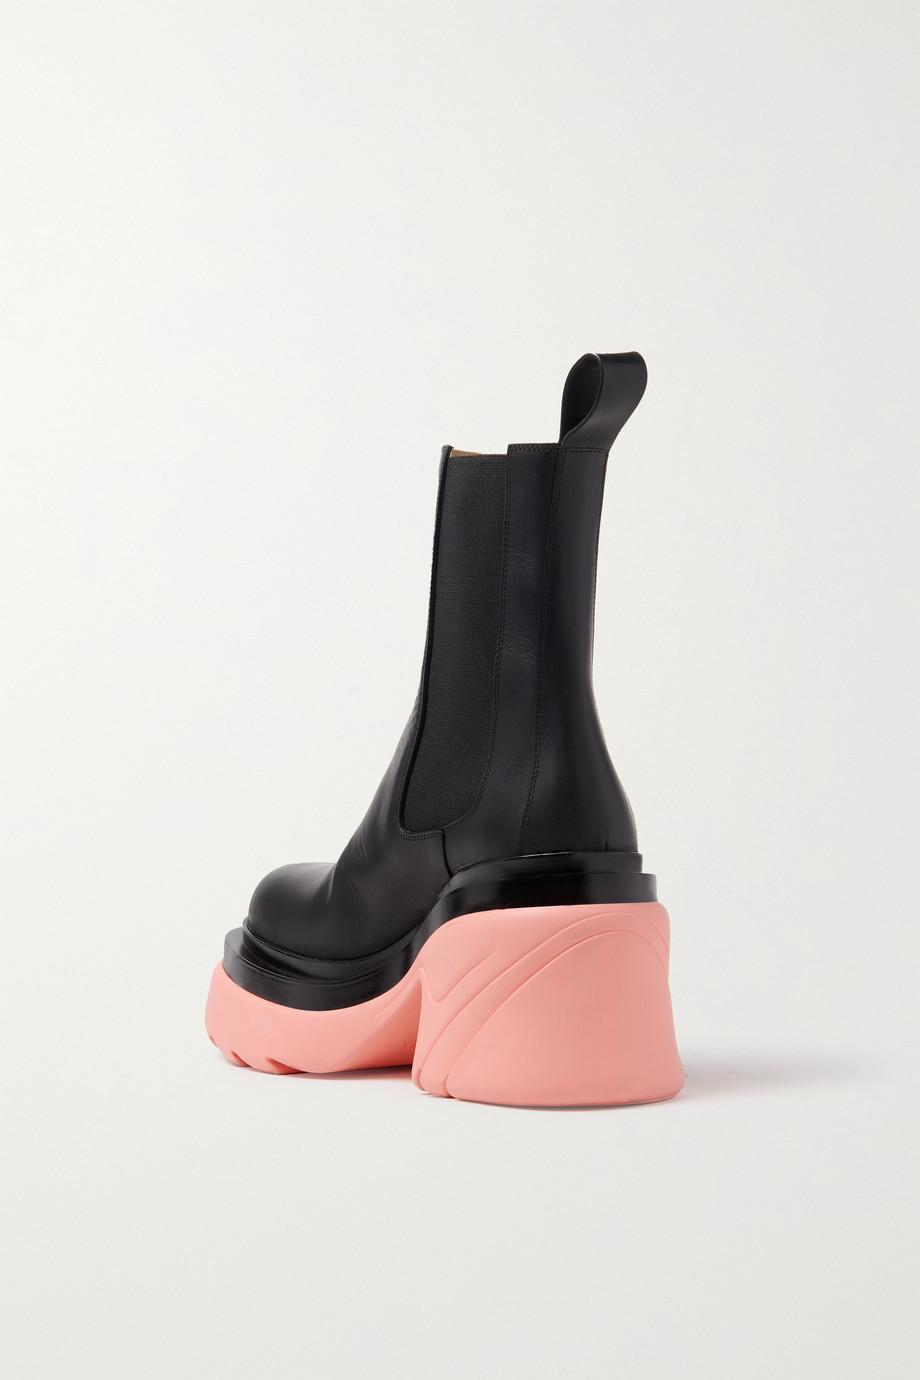 Bottega Veneta Leather platform Chelsea boots